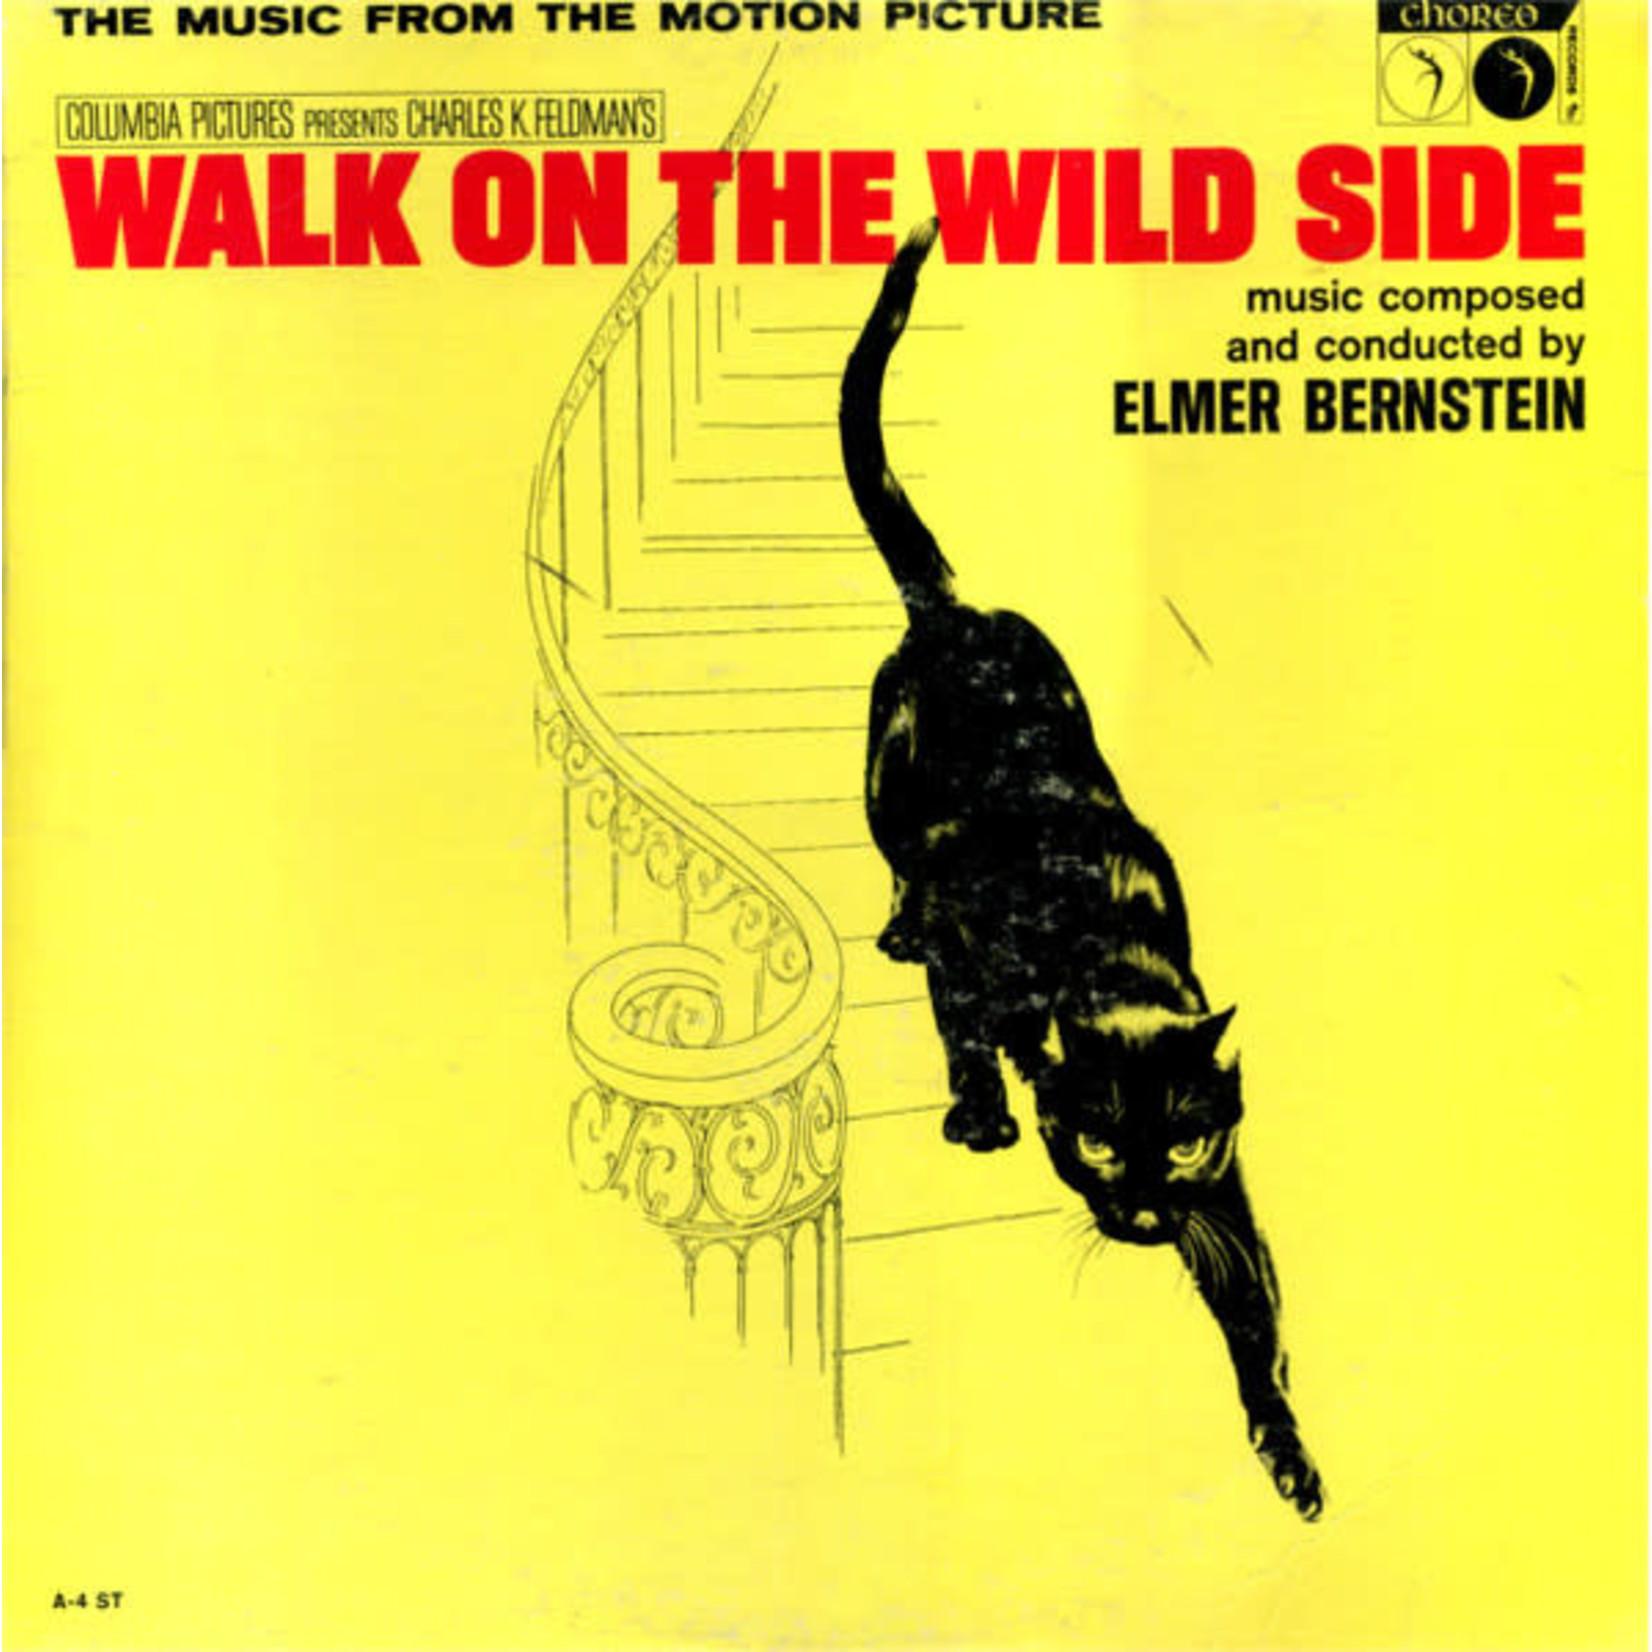 [Vintage] Bernstein, Elmer: Walk on the Wild Side (Soundtrack)